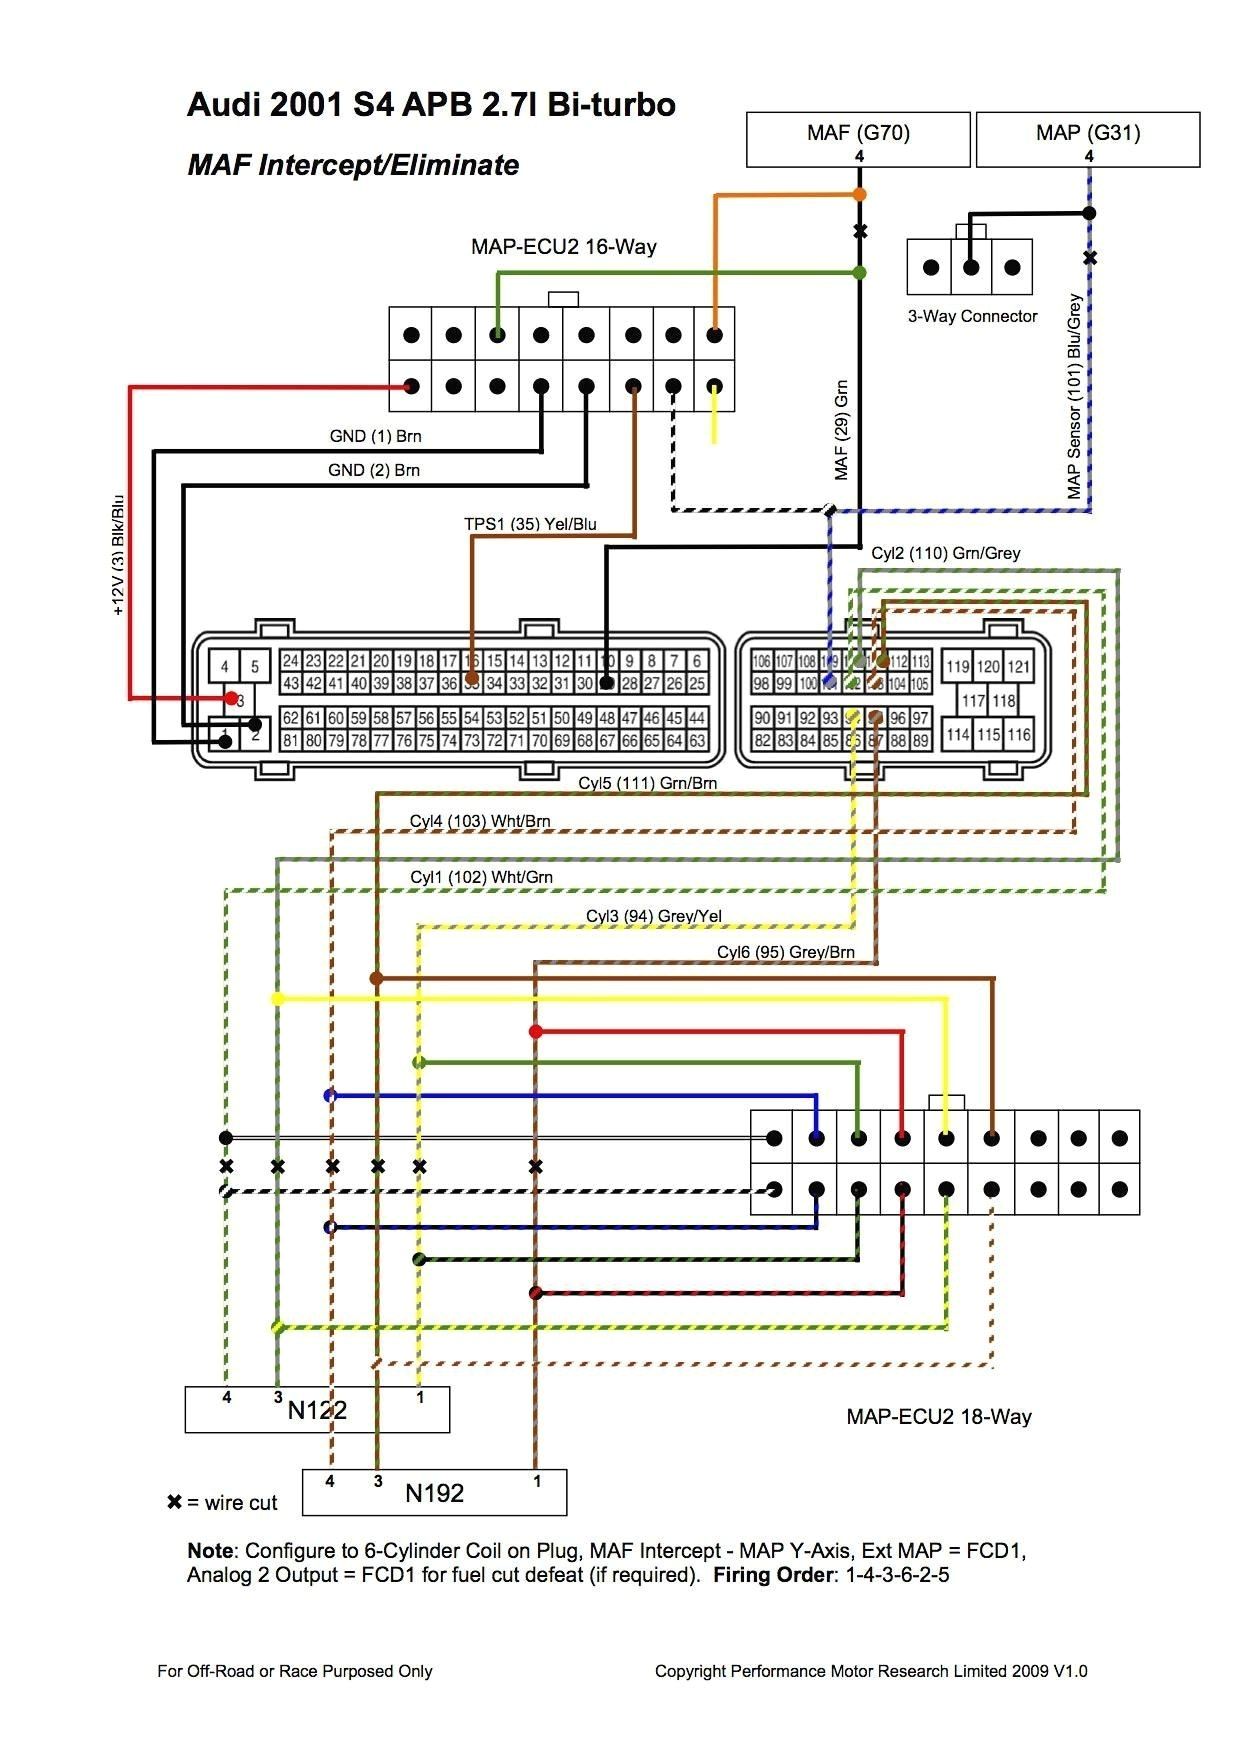 2002 dodge ram 1500 trailer wiring harness wiring diagrams konsult 2002 dodge ram 1500 trailer wiring harness free download wiring